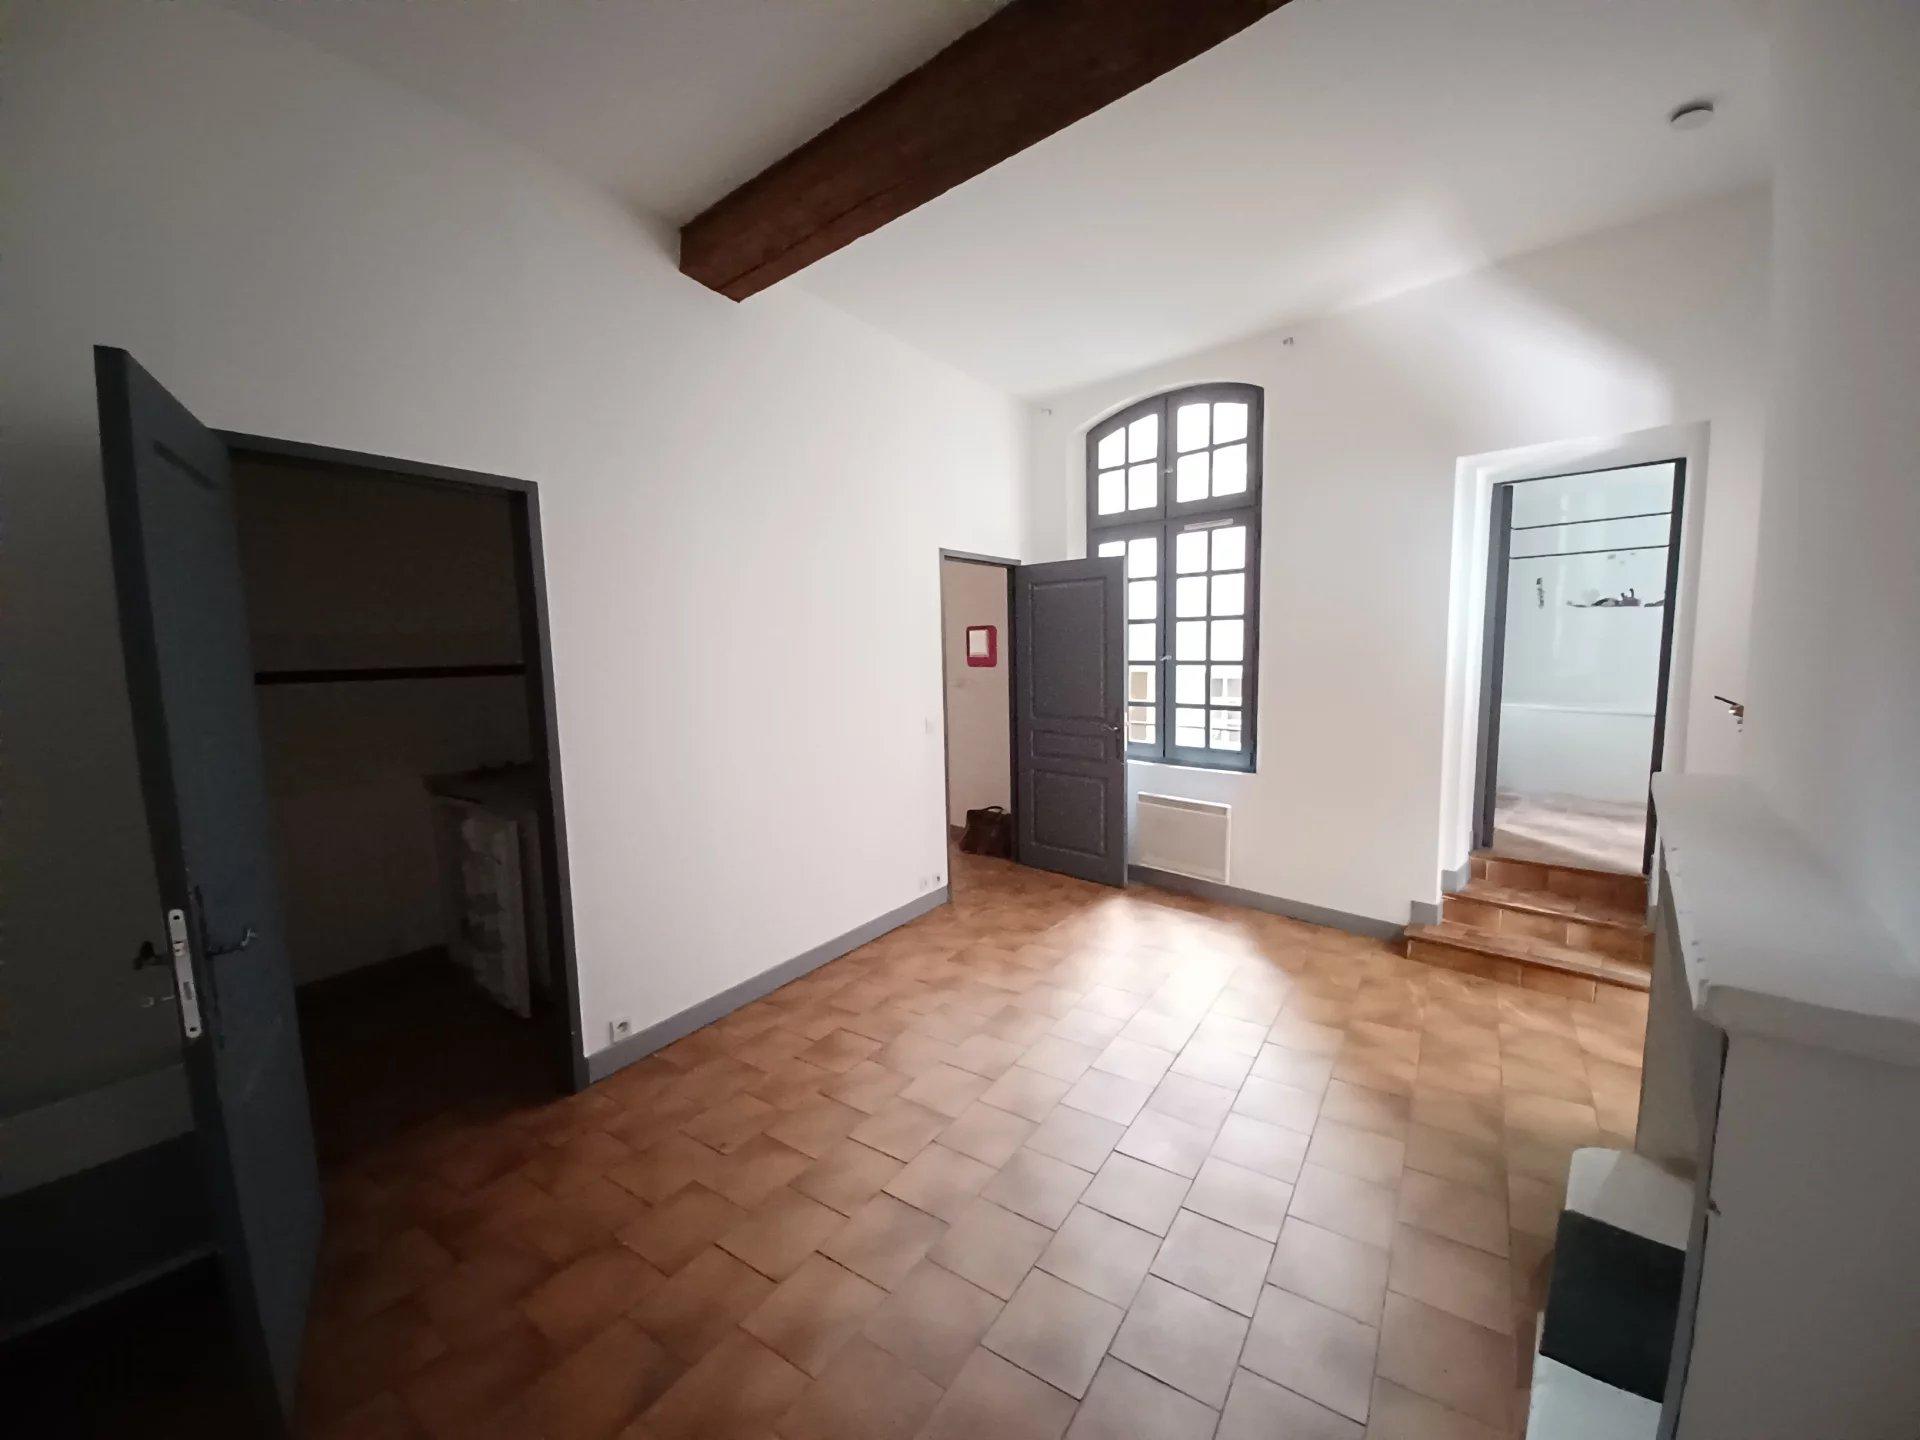 Location Appartement BEAUCAIRE Mandat : 0219